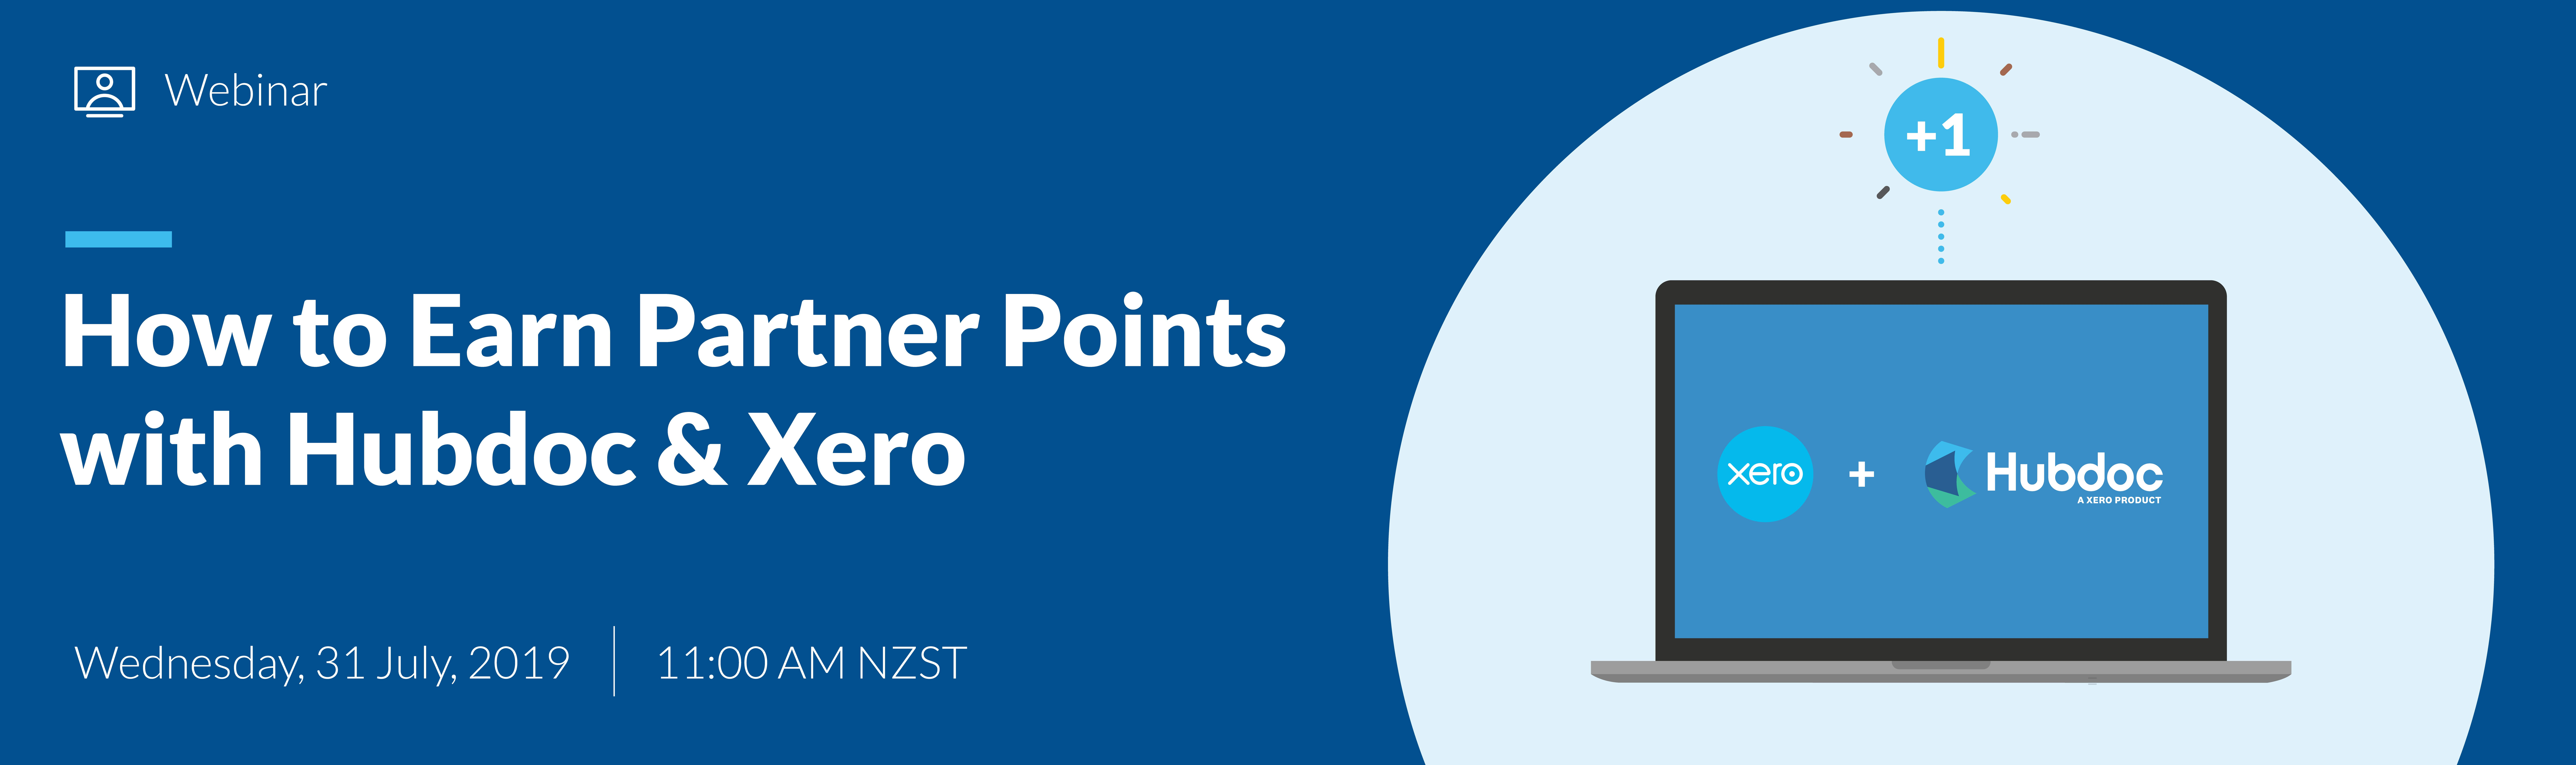 Xero Partner Points Webinar_Landing Page with Date - NZ (1)